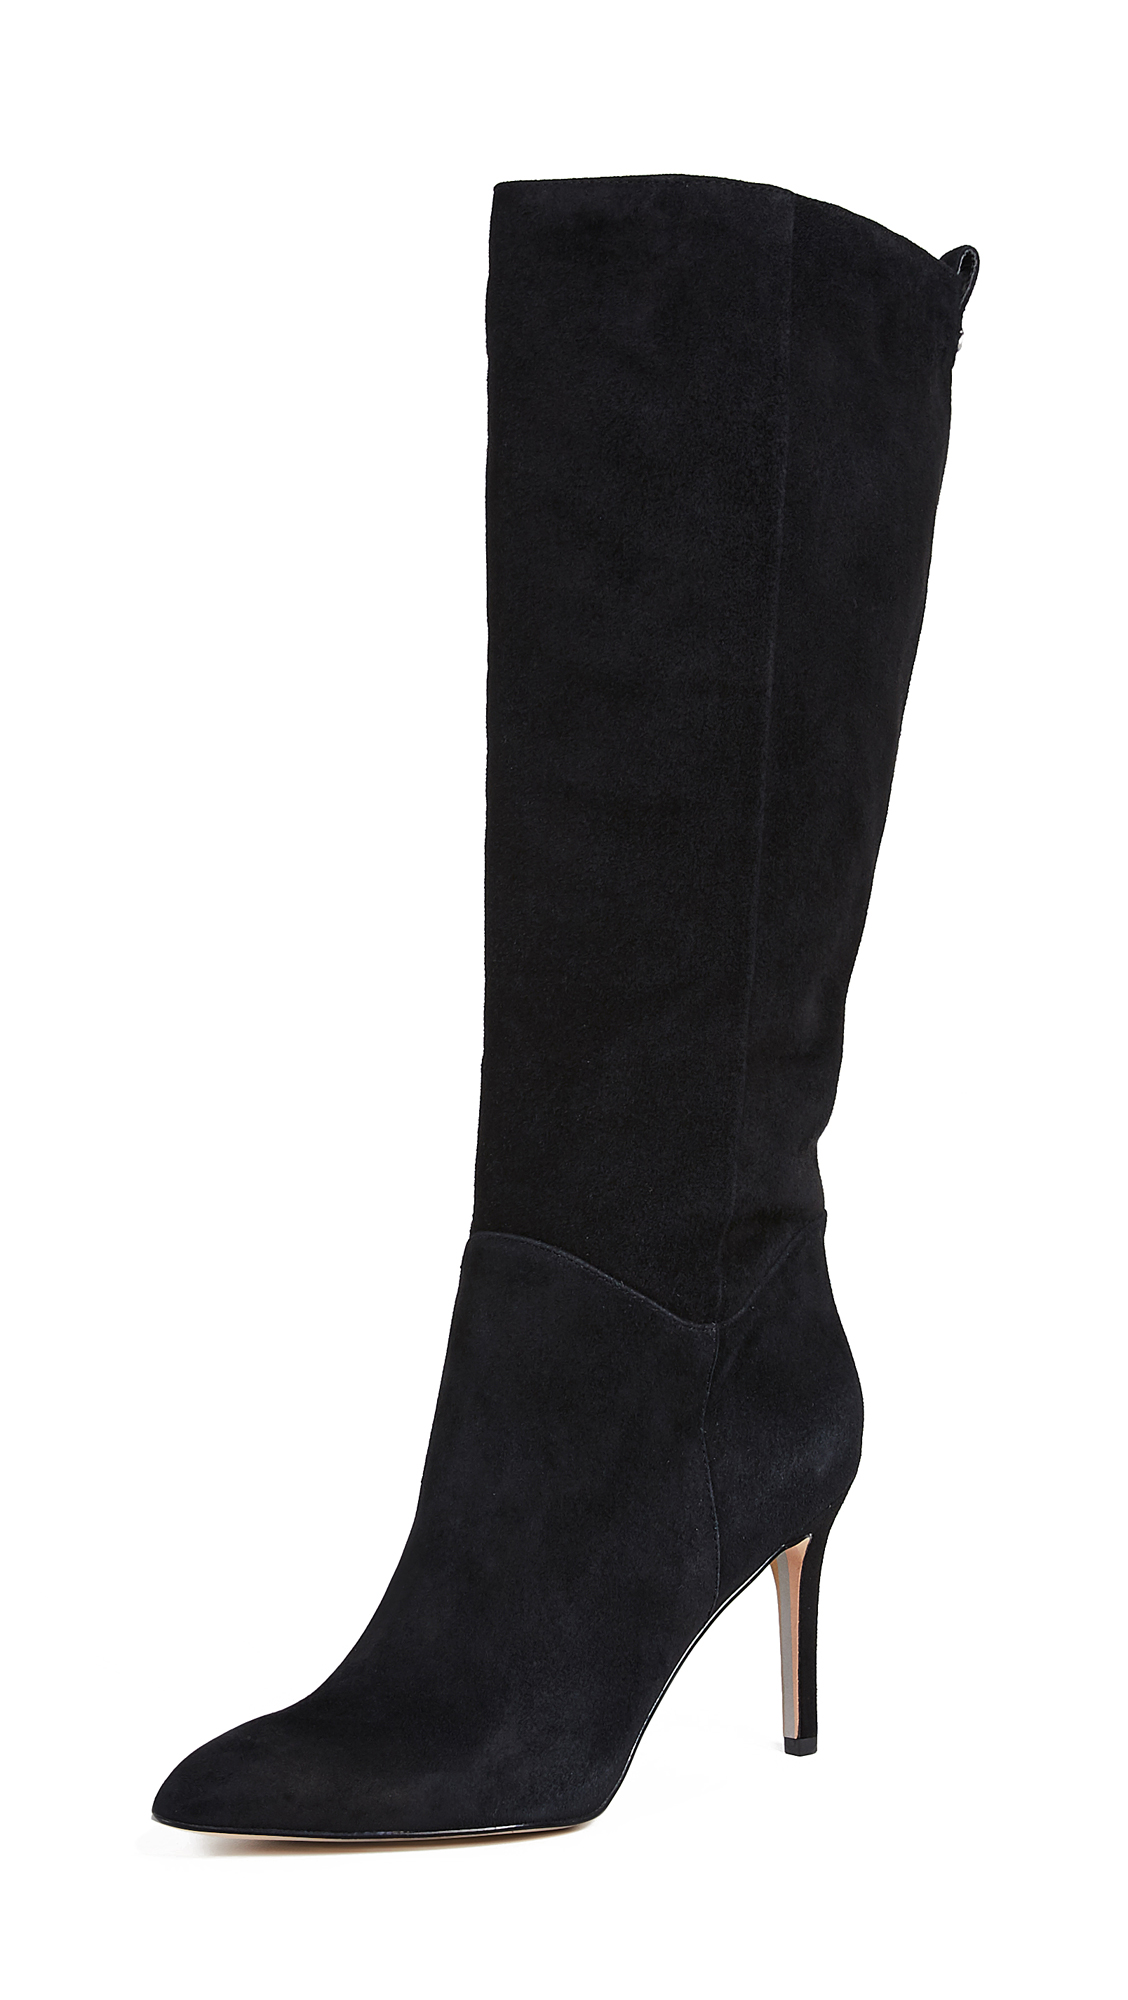 Sam Edelman Olen Tall Boots - Black